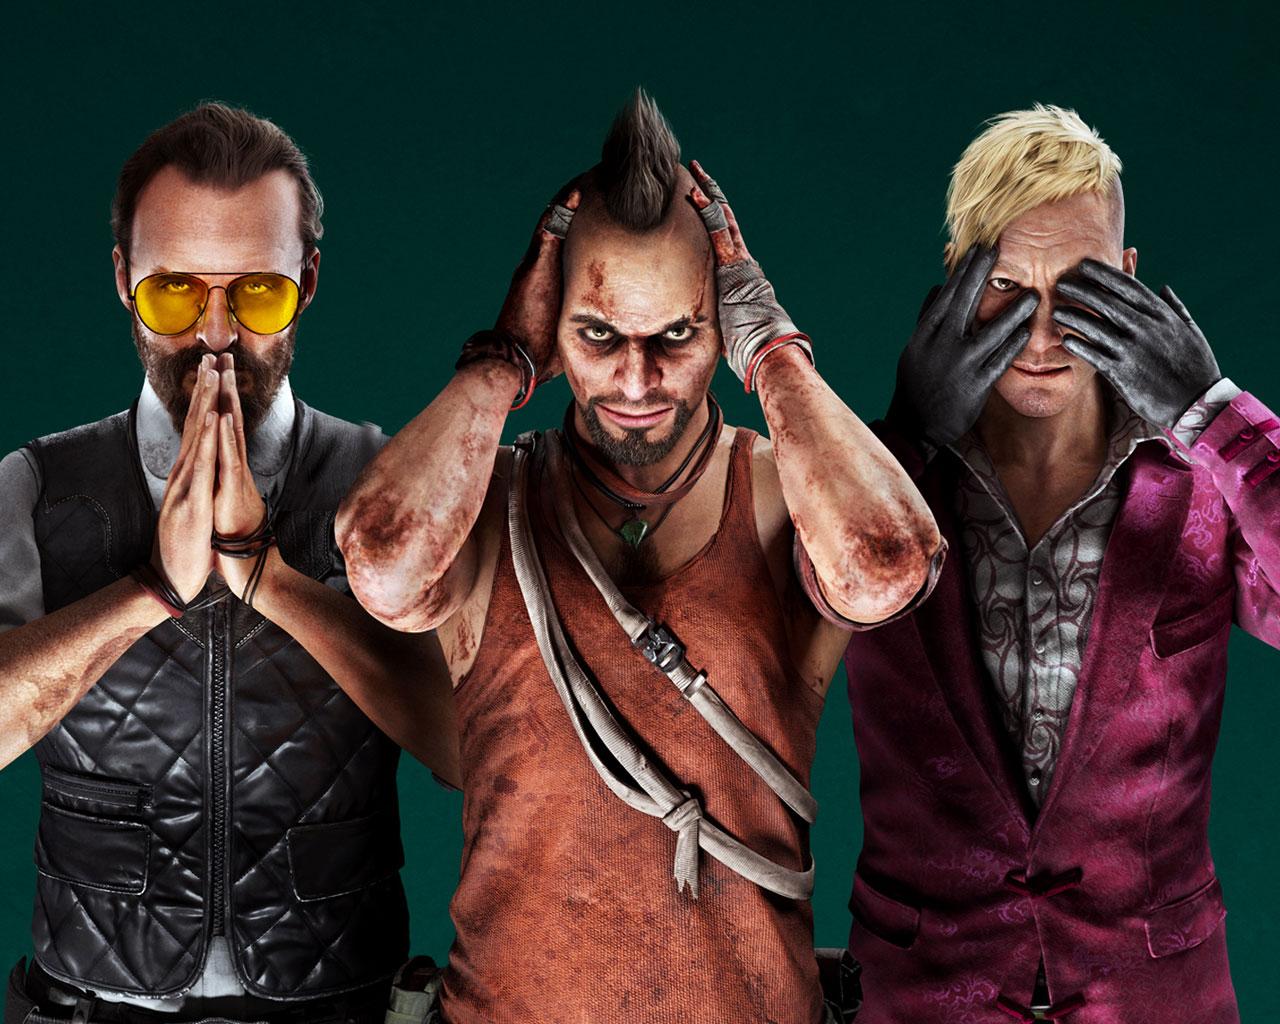 Free Far Cry 6 Wallpaper in 1280x1024